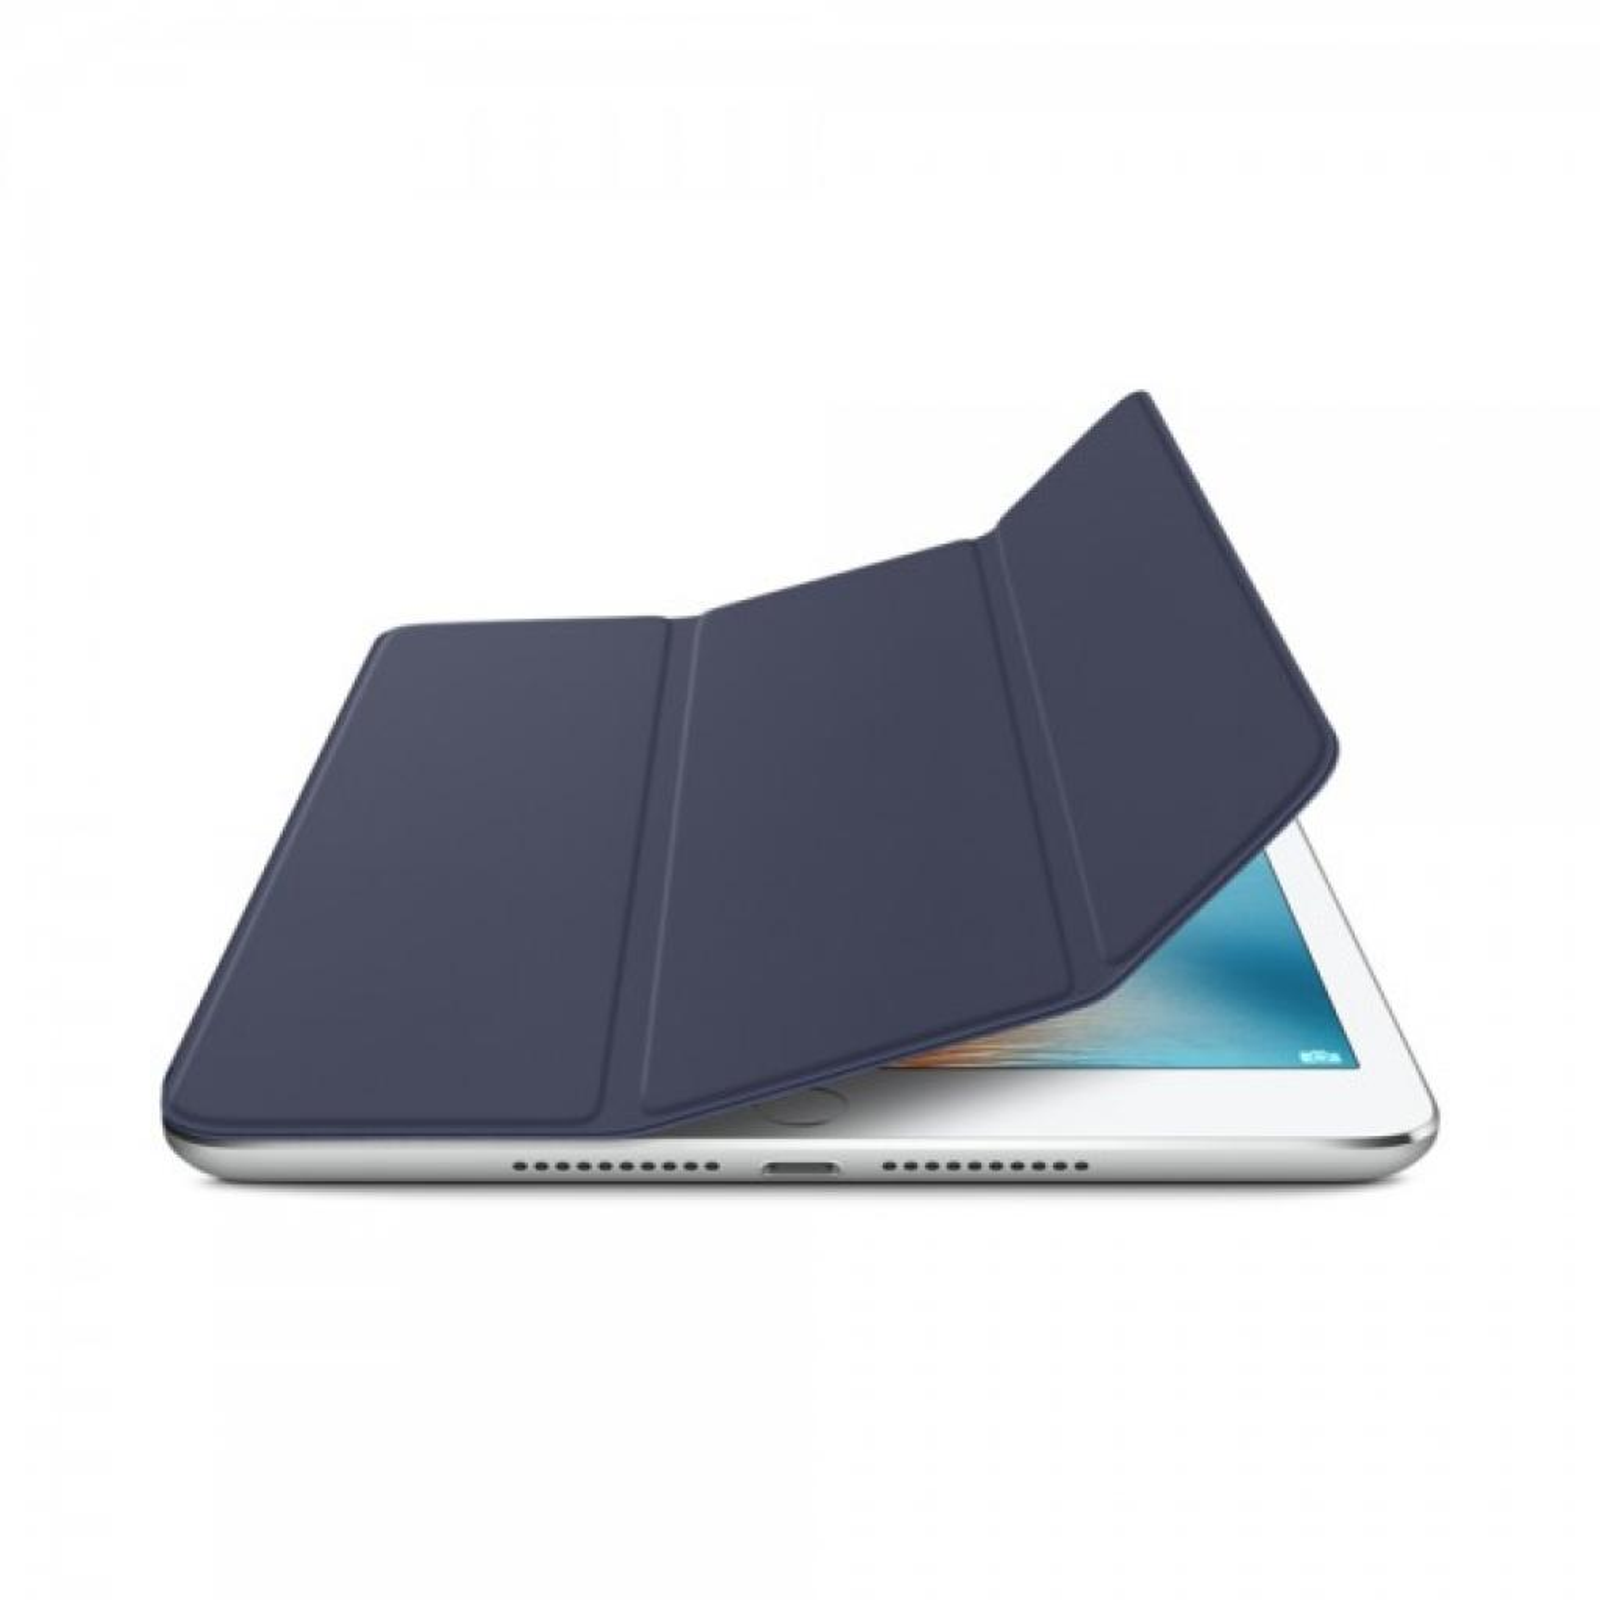 Чехол для планшета Apple Smart Cover для iPad mini 4 Midnight Blue (MKLX2ZM/A) изображение 2